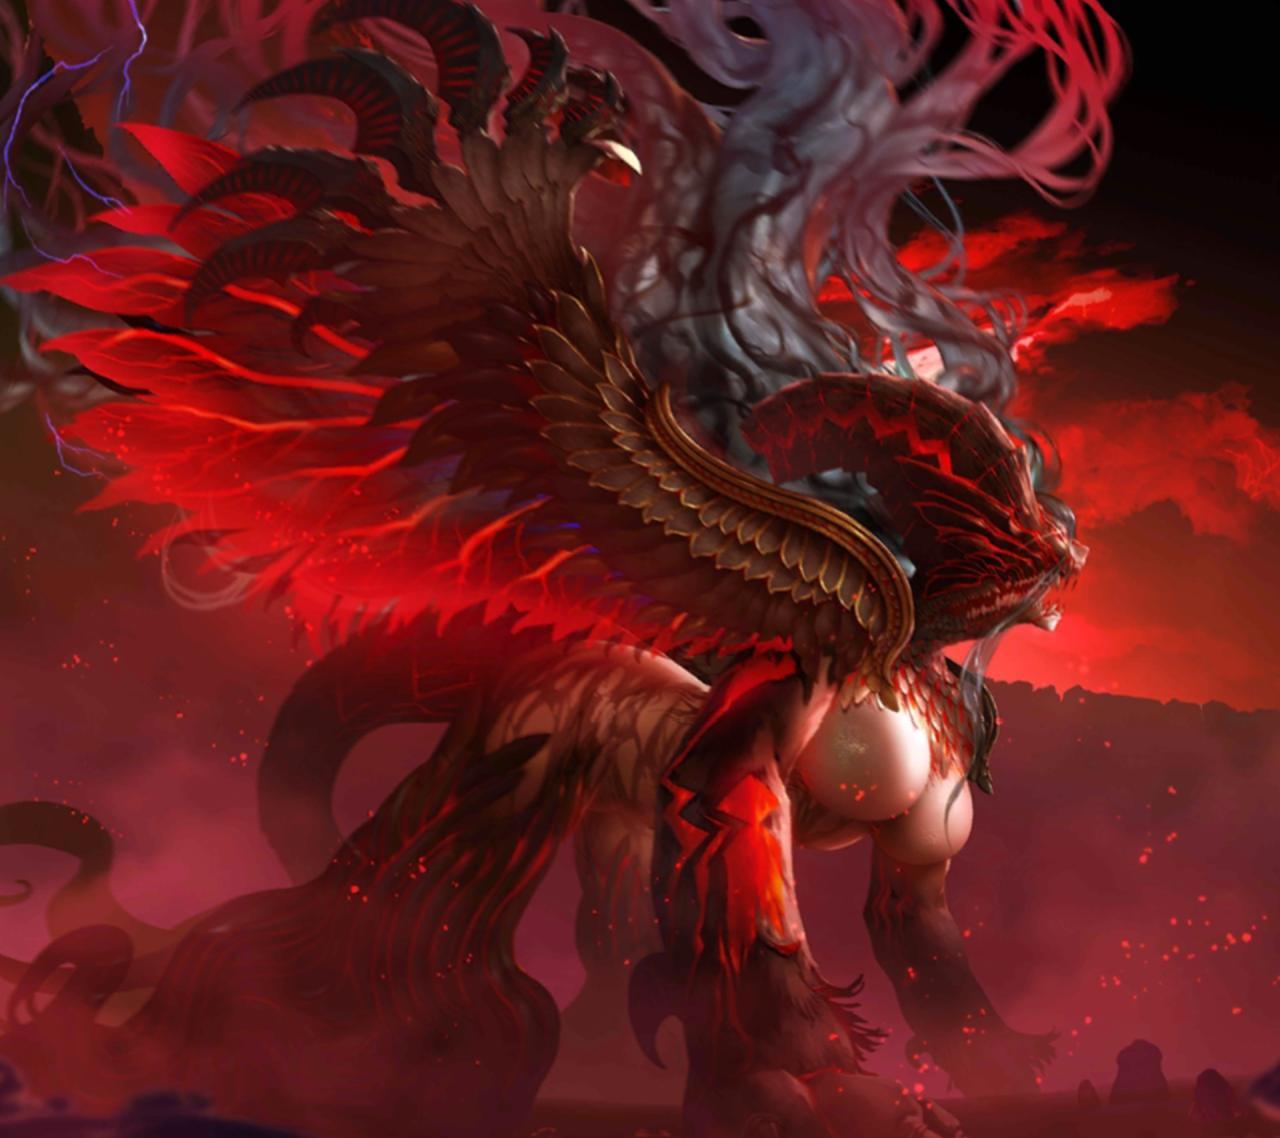 fate beast_Tiamat (Fate/Grand Order) | VS Battles Wiki | FANDOM powered by Wikia